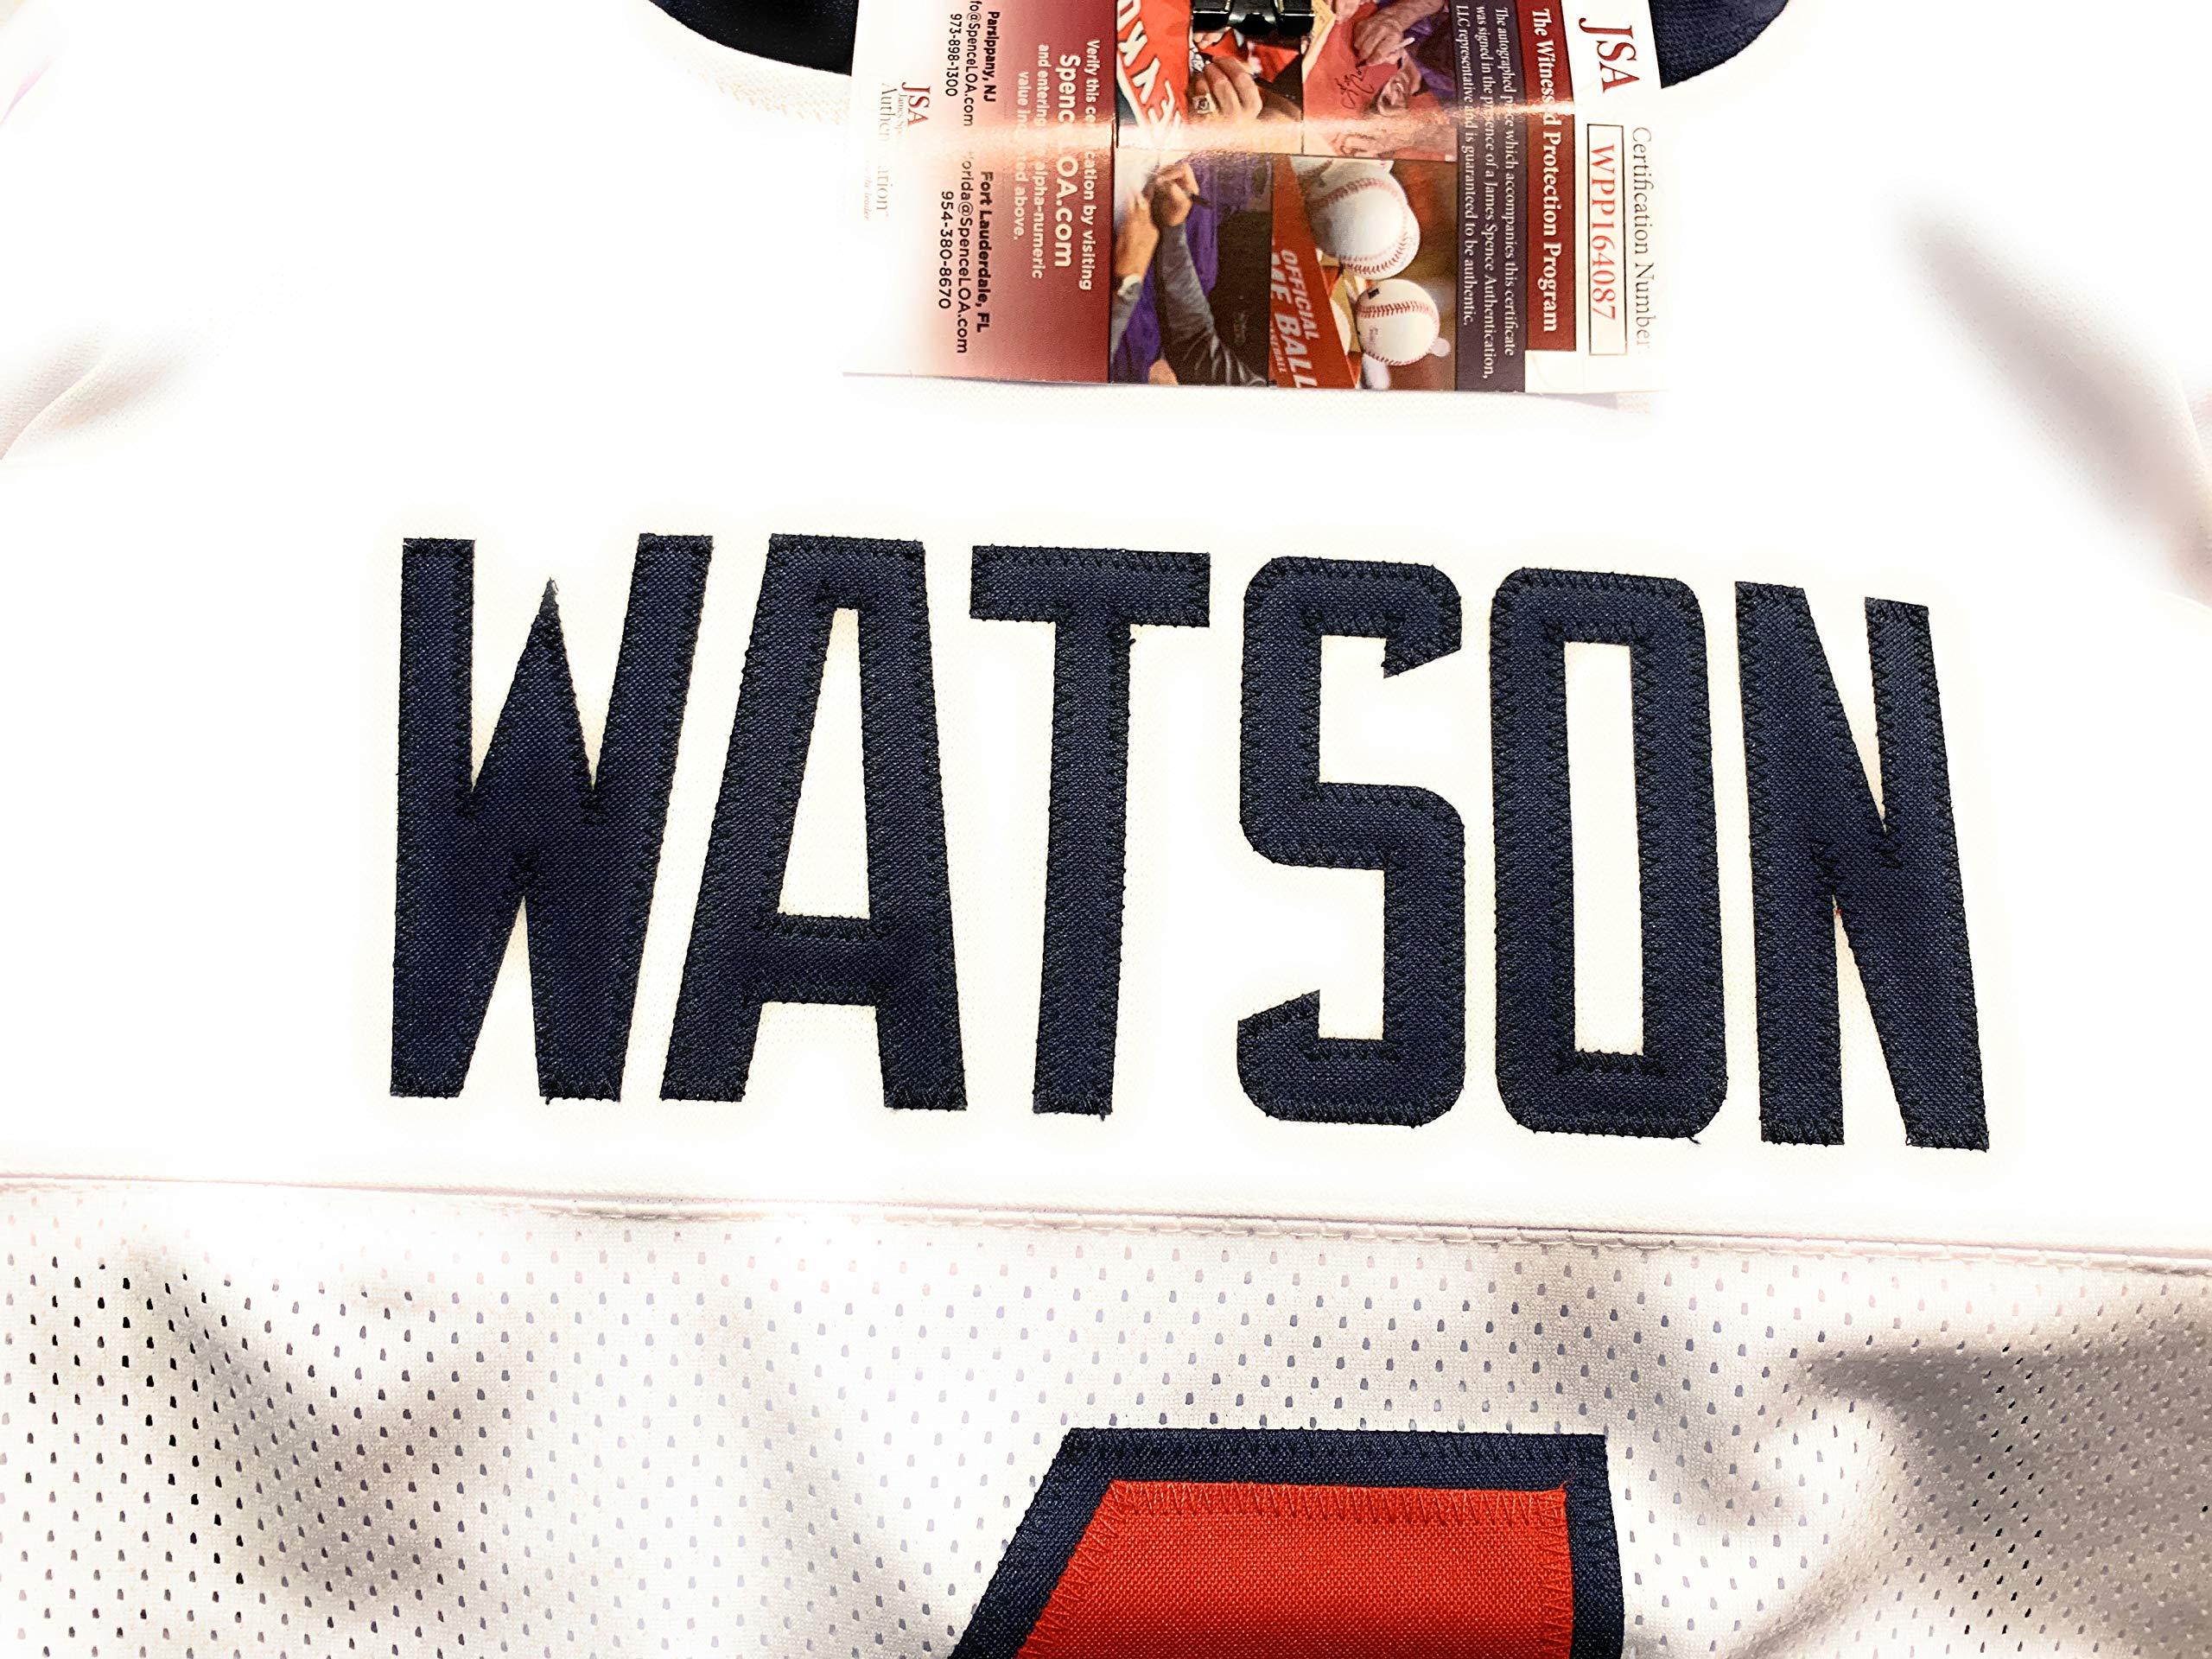 Deshaun Watson Houston Texans Signed Autograph White Custom Jersey JSA Witnessed Certified